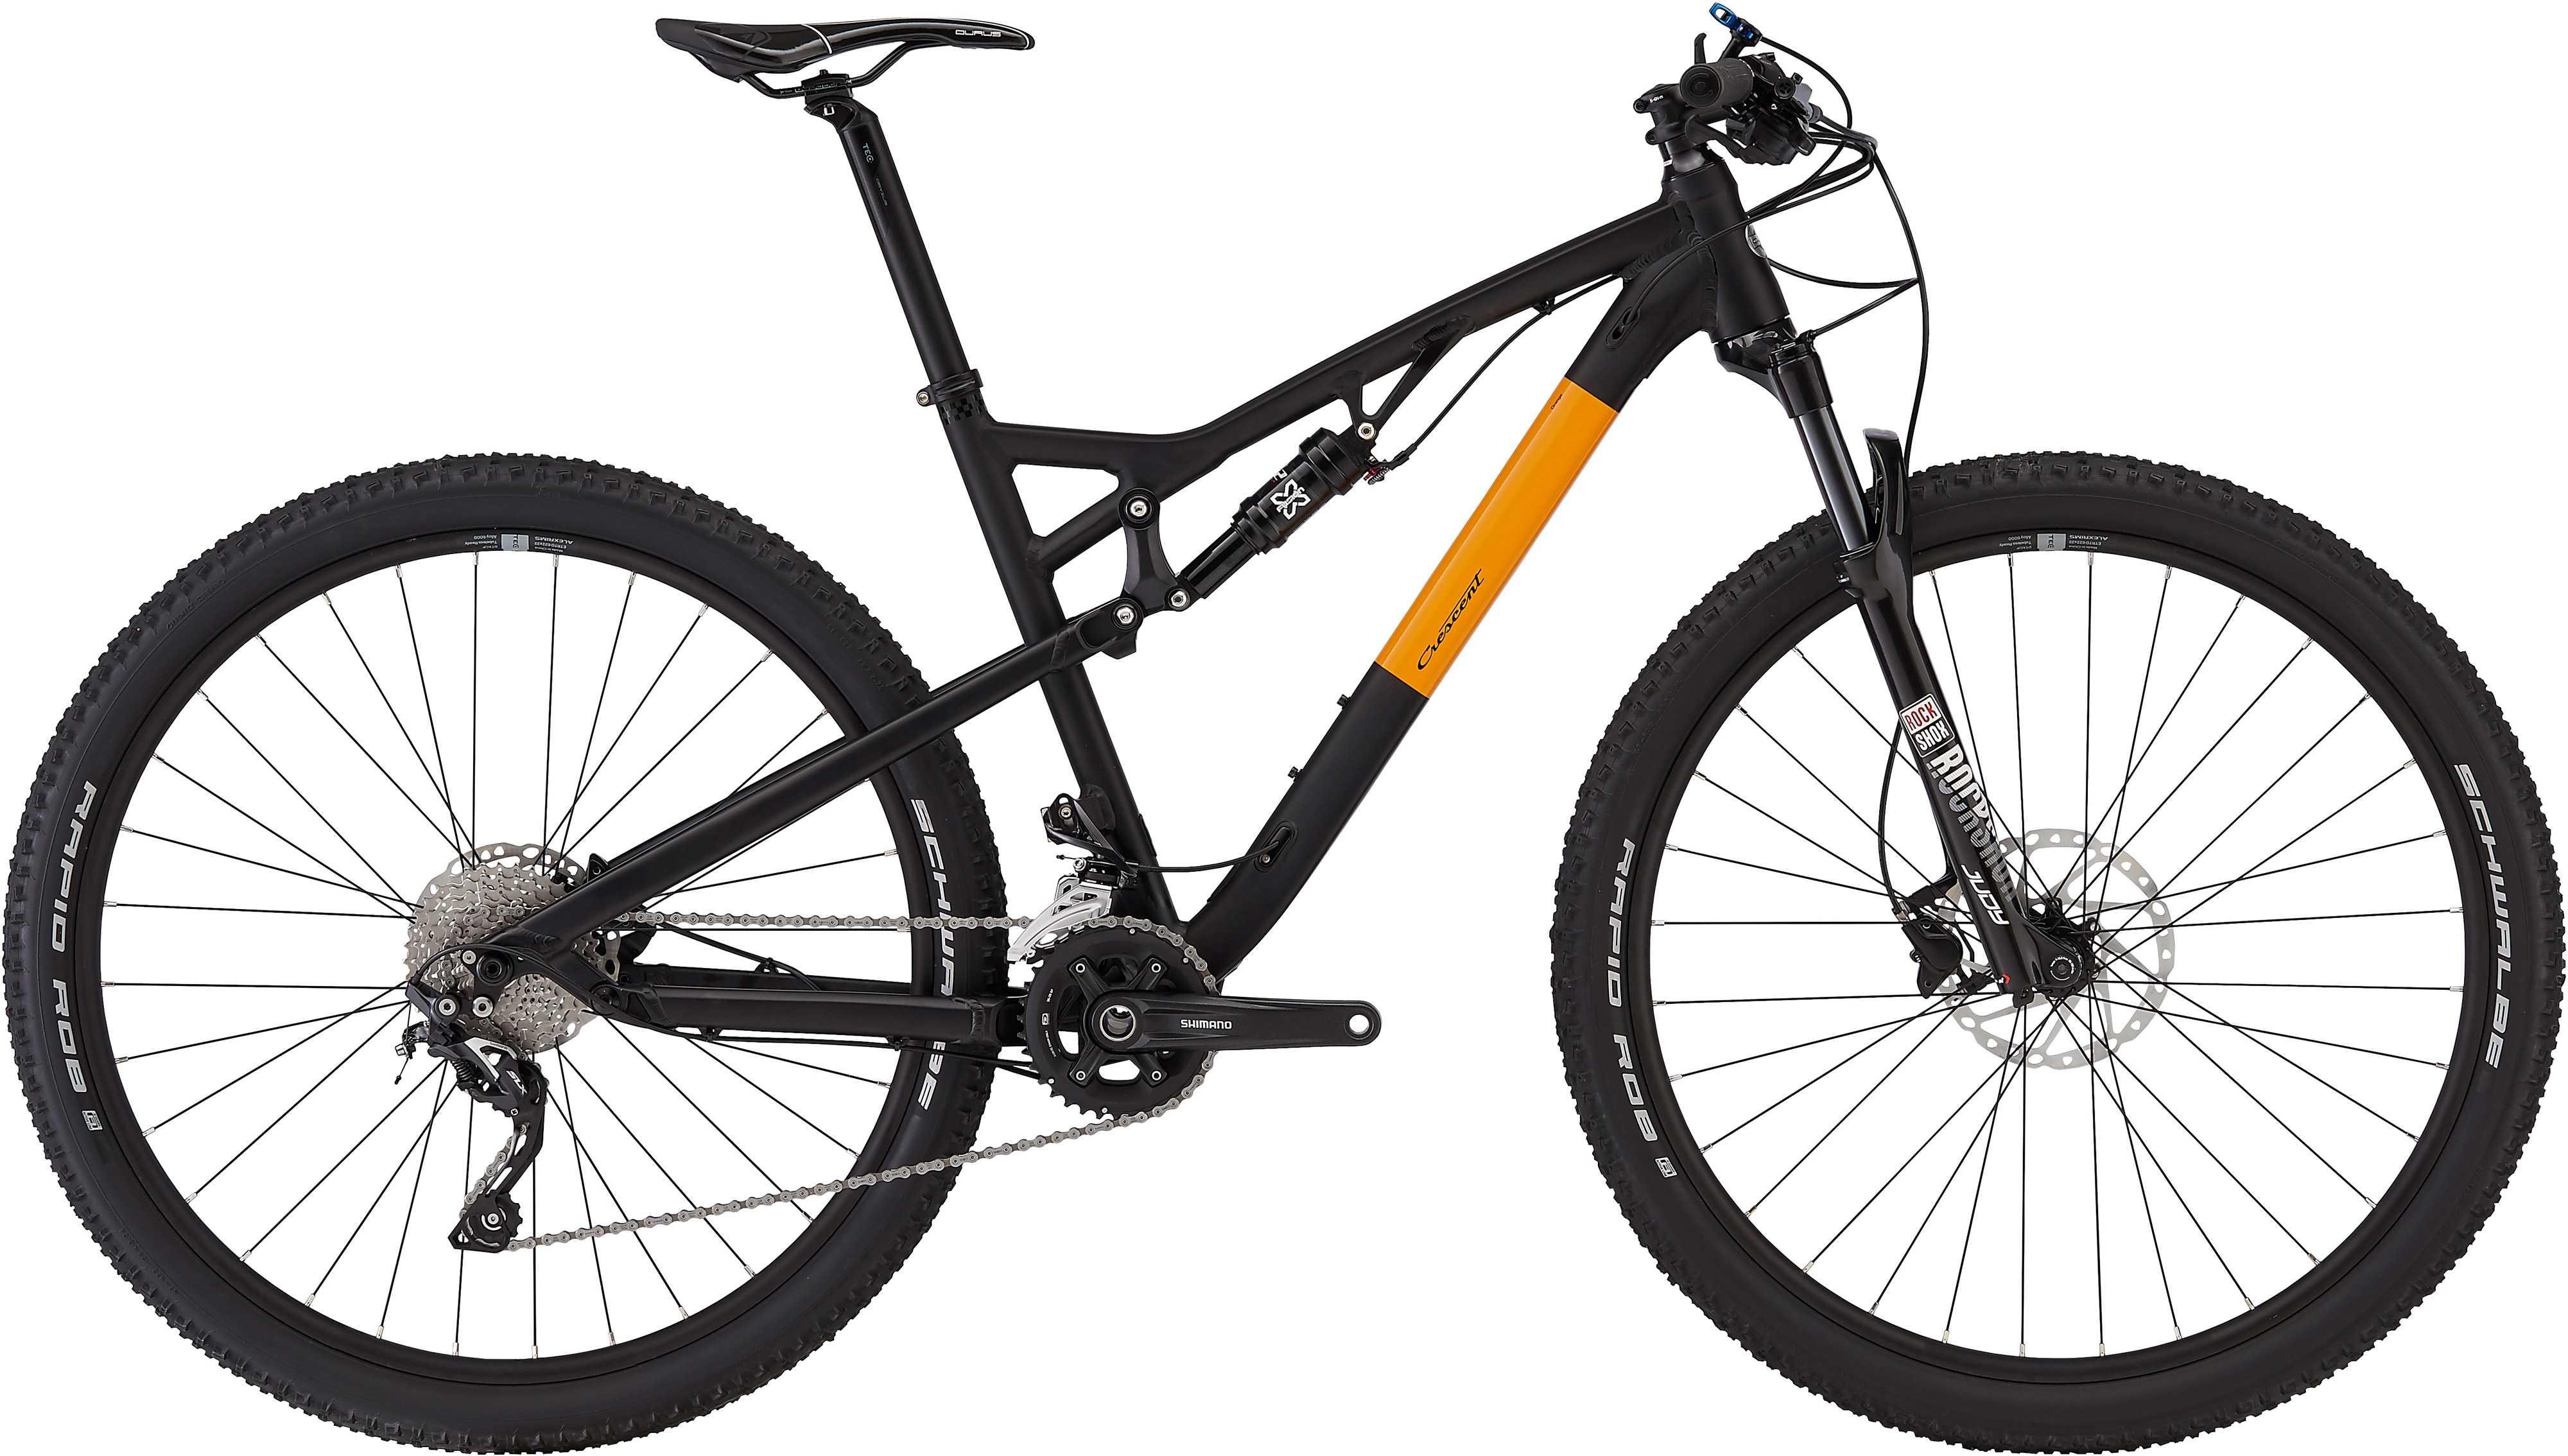 Crescent Stark S40 29 matt svart 39 cm